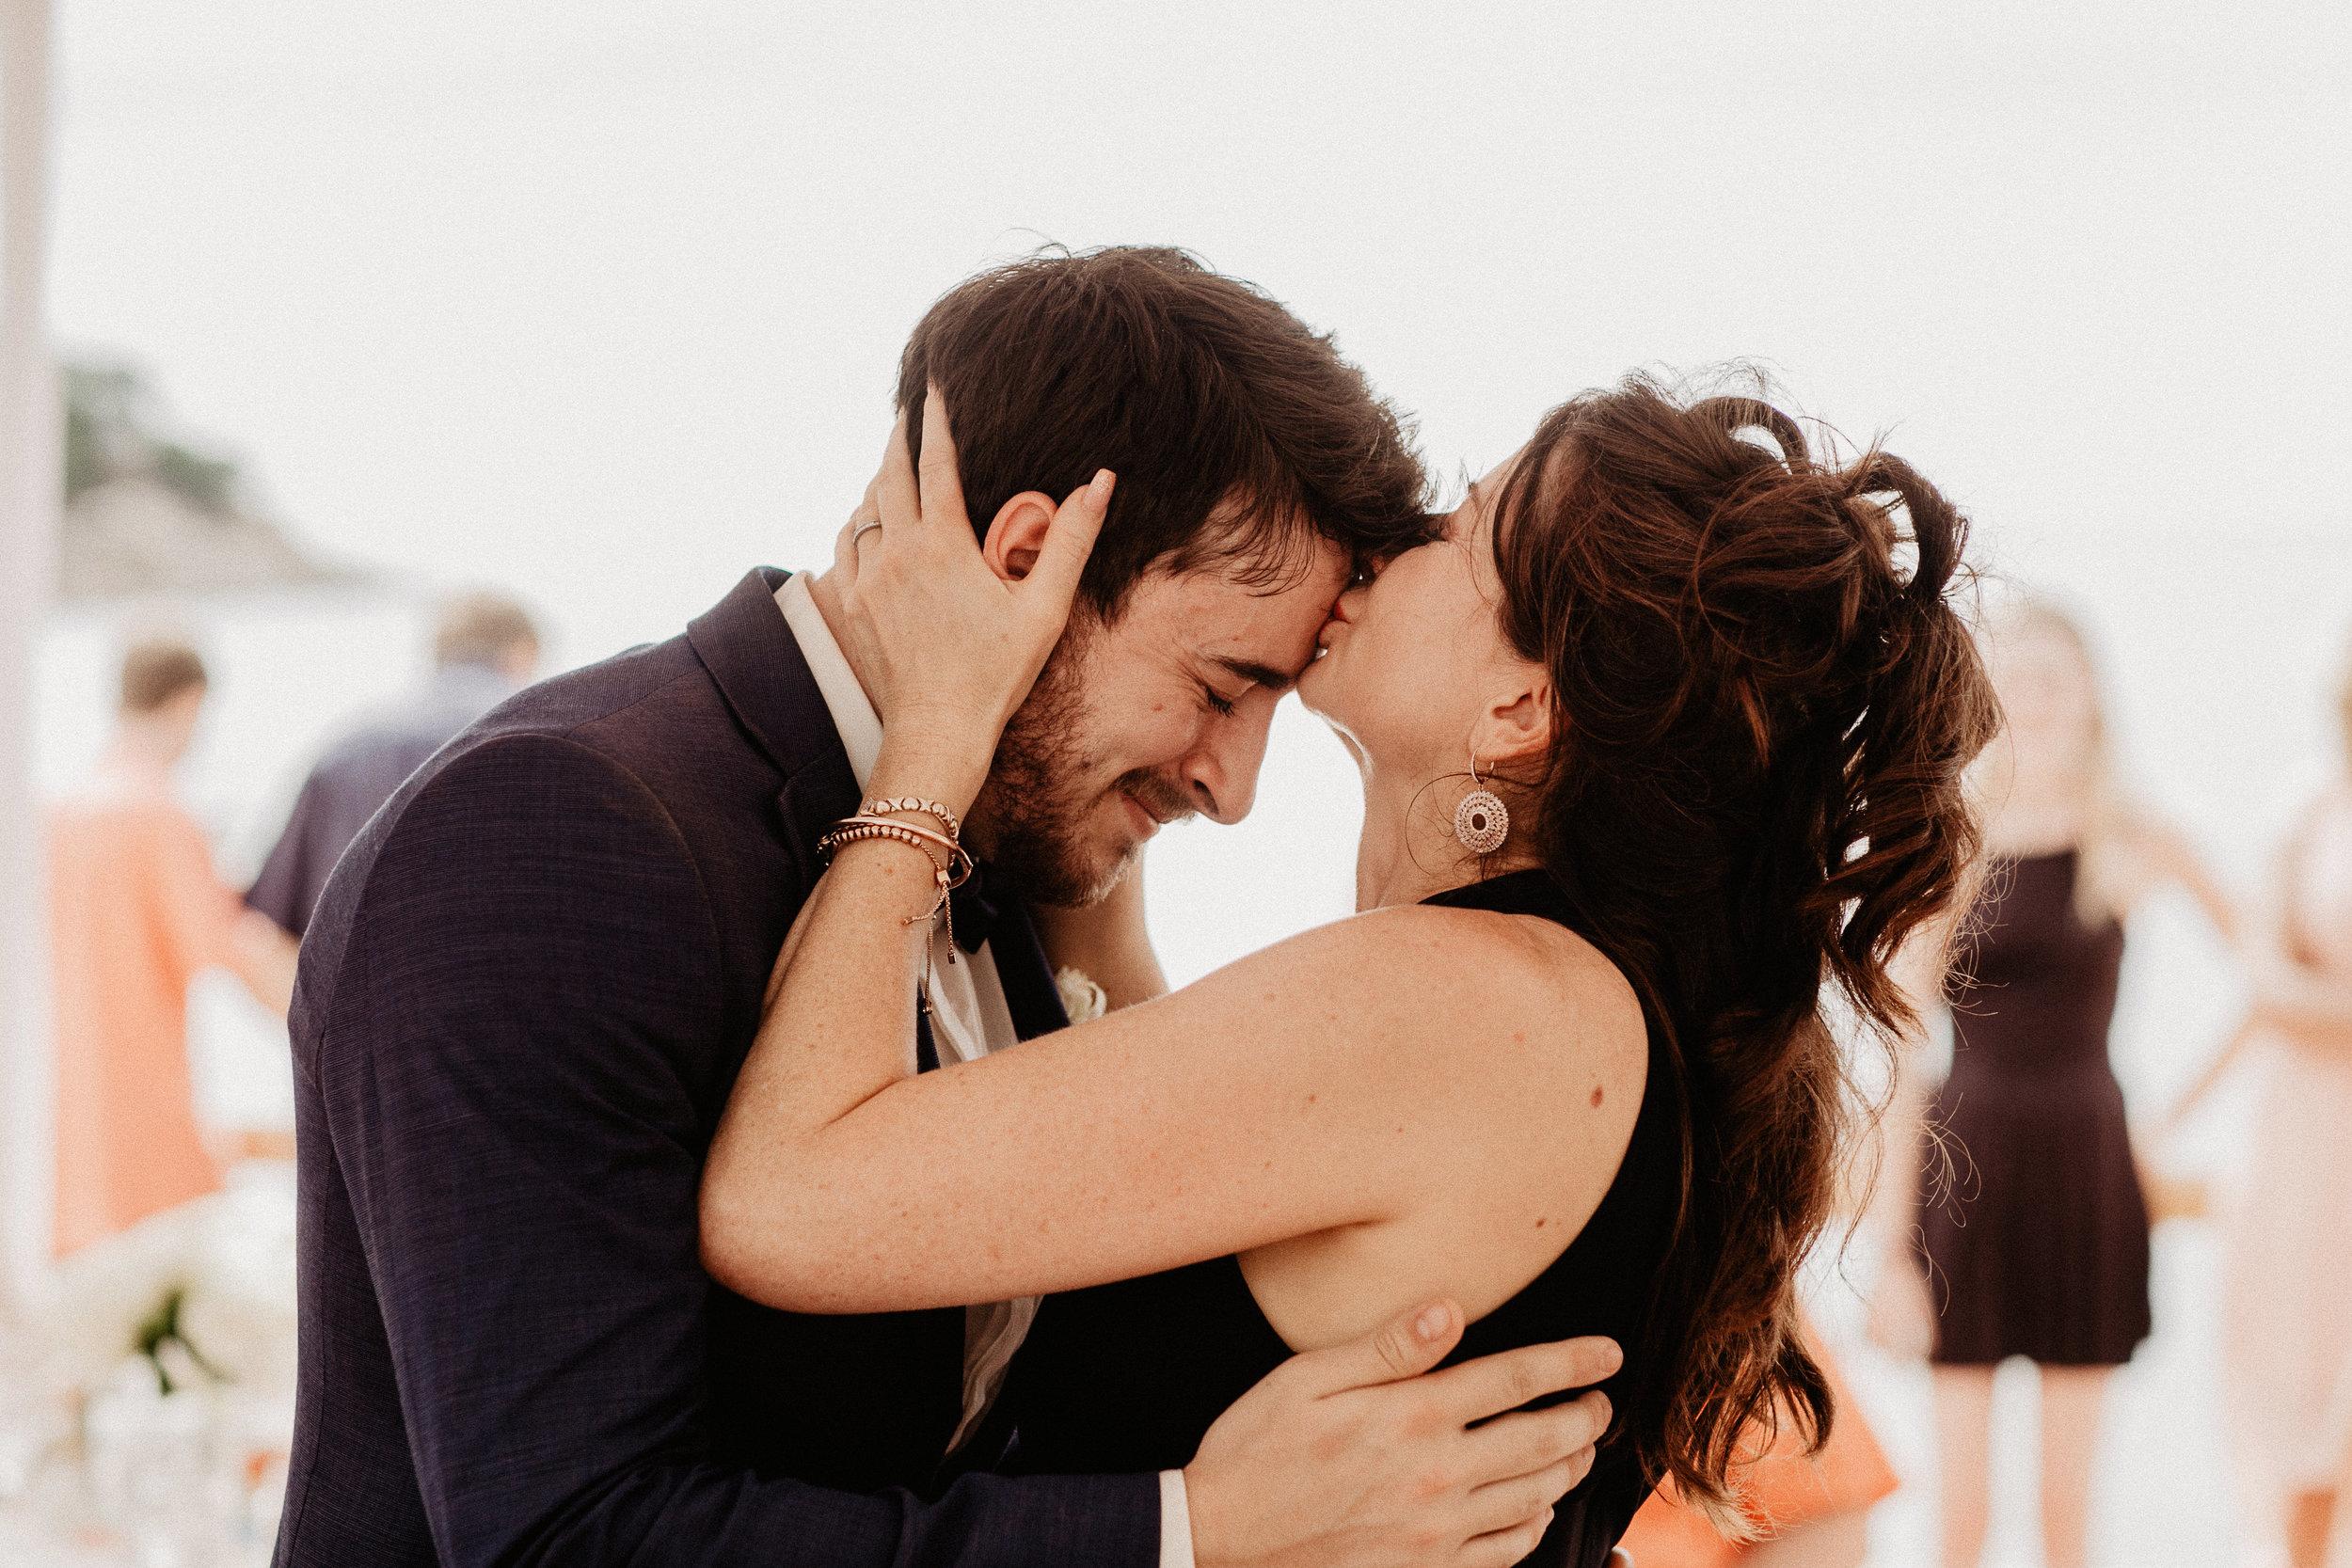 alfonso_flores_destination_wedding_photography_puerto_vallarta_hotel_barcelo_vallarta_cuttler_amela-494.JPG